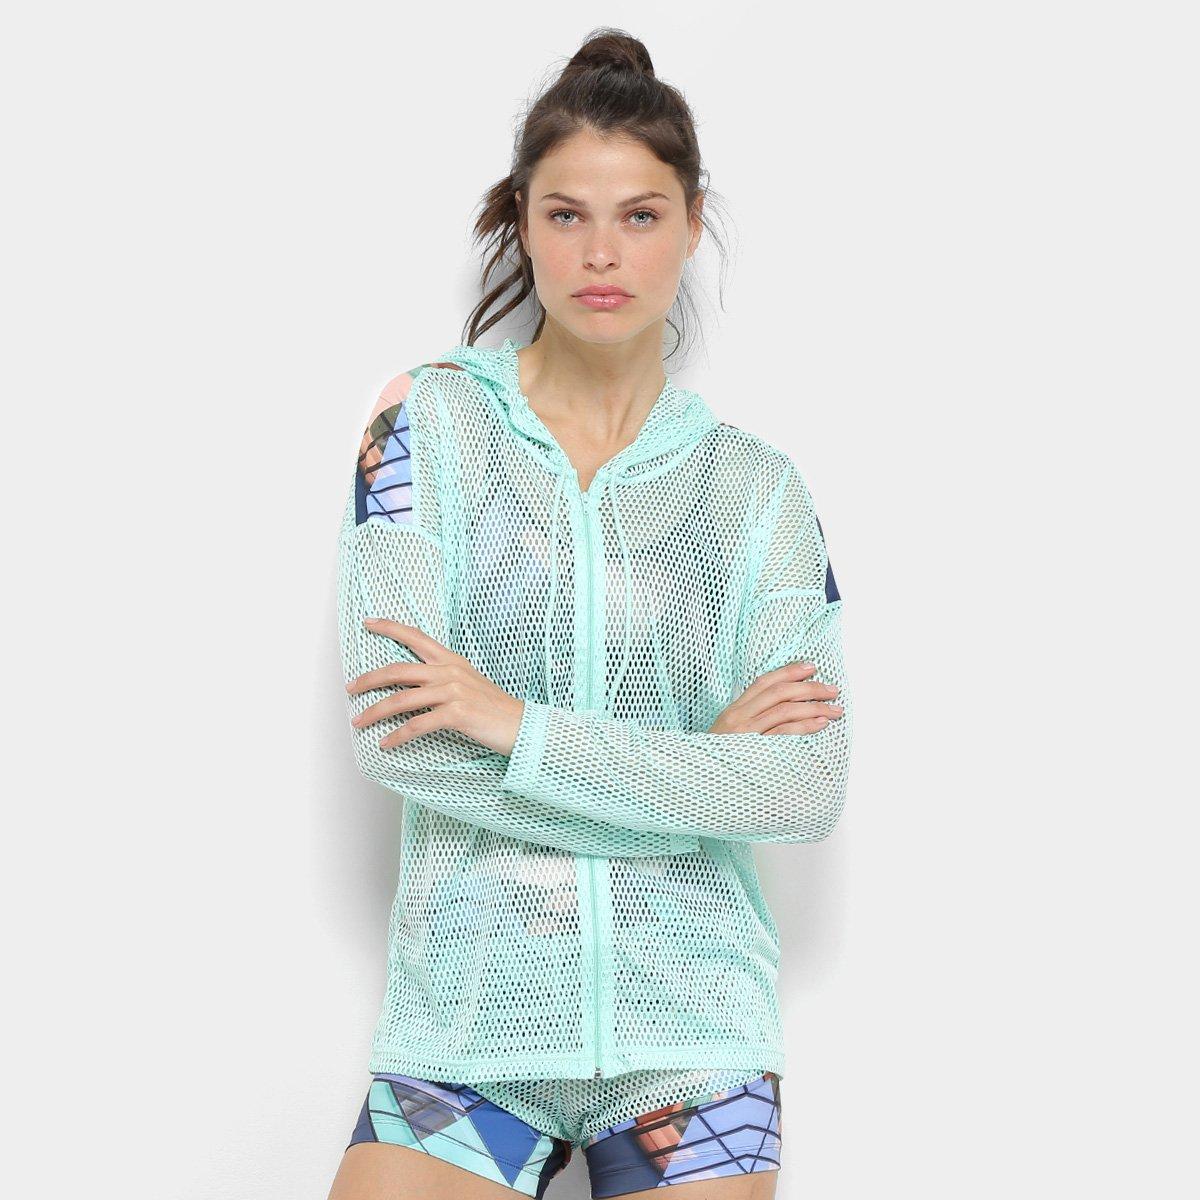 937a66b27e4 FornecedorNetshoes. Jaqueta Adidas Collab Jacket Feminina